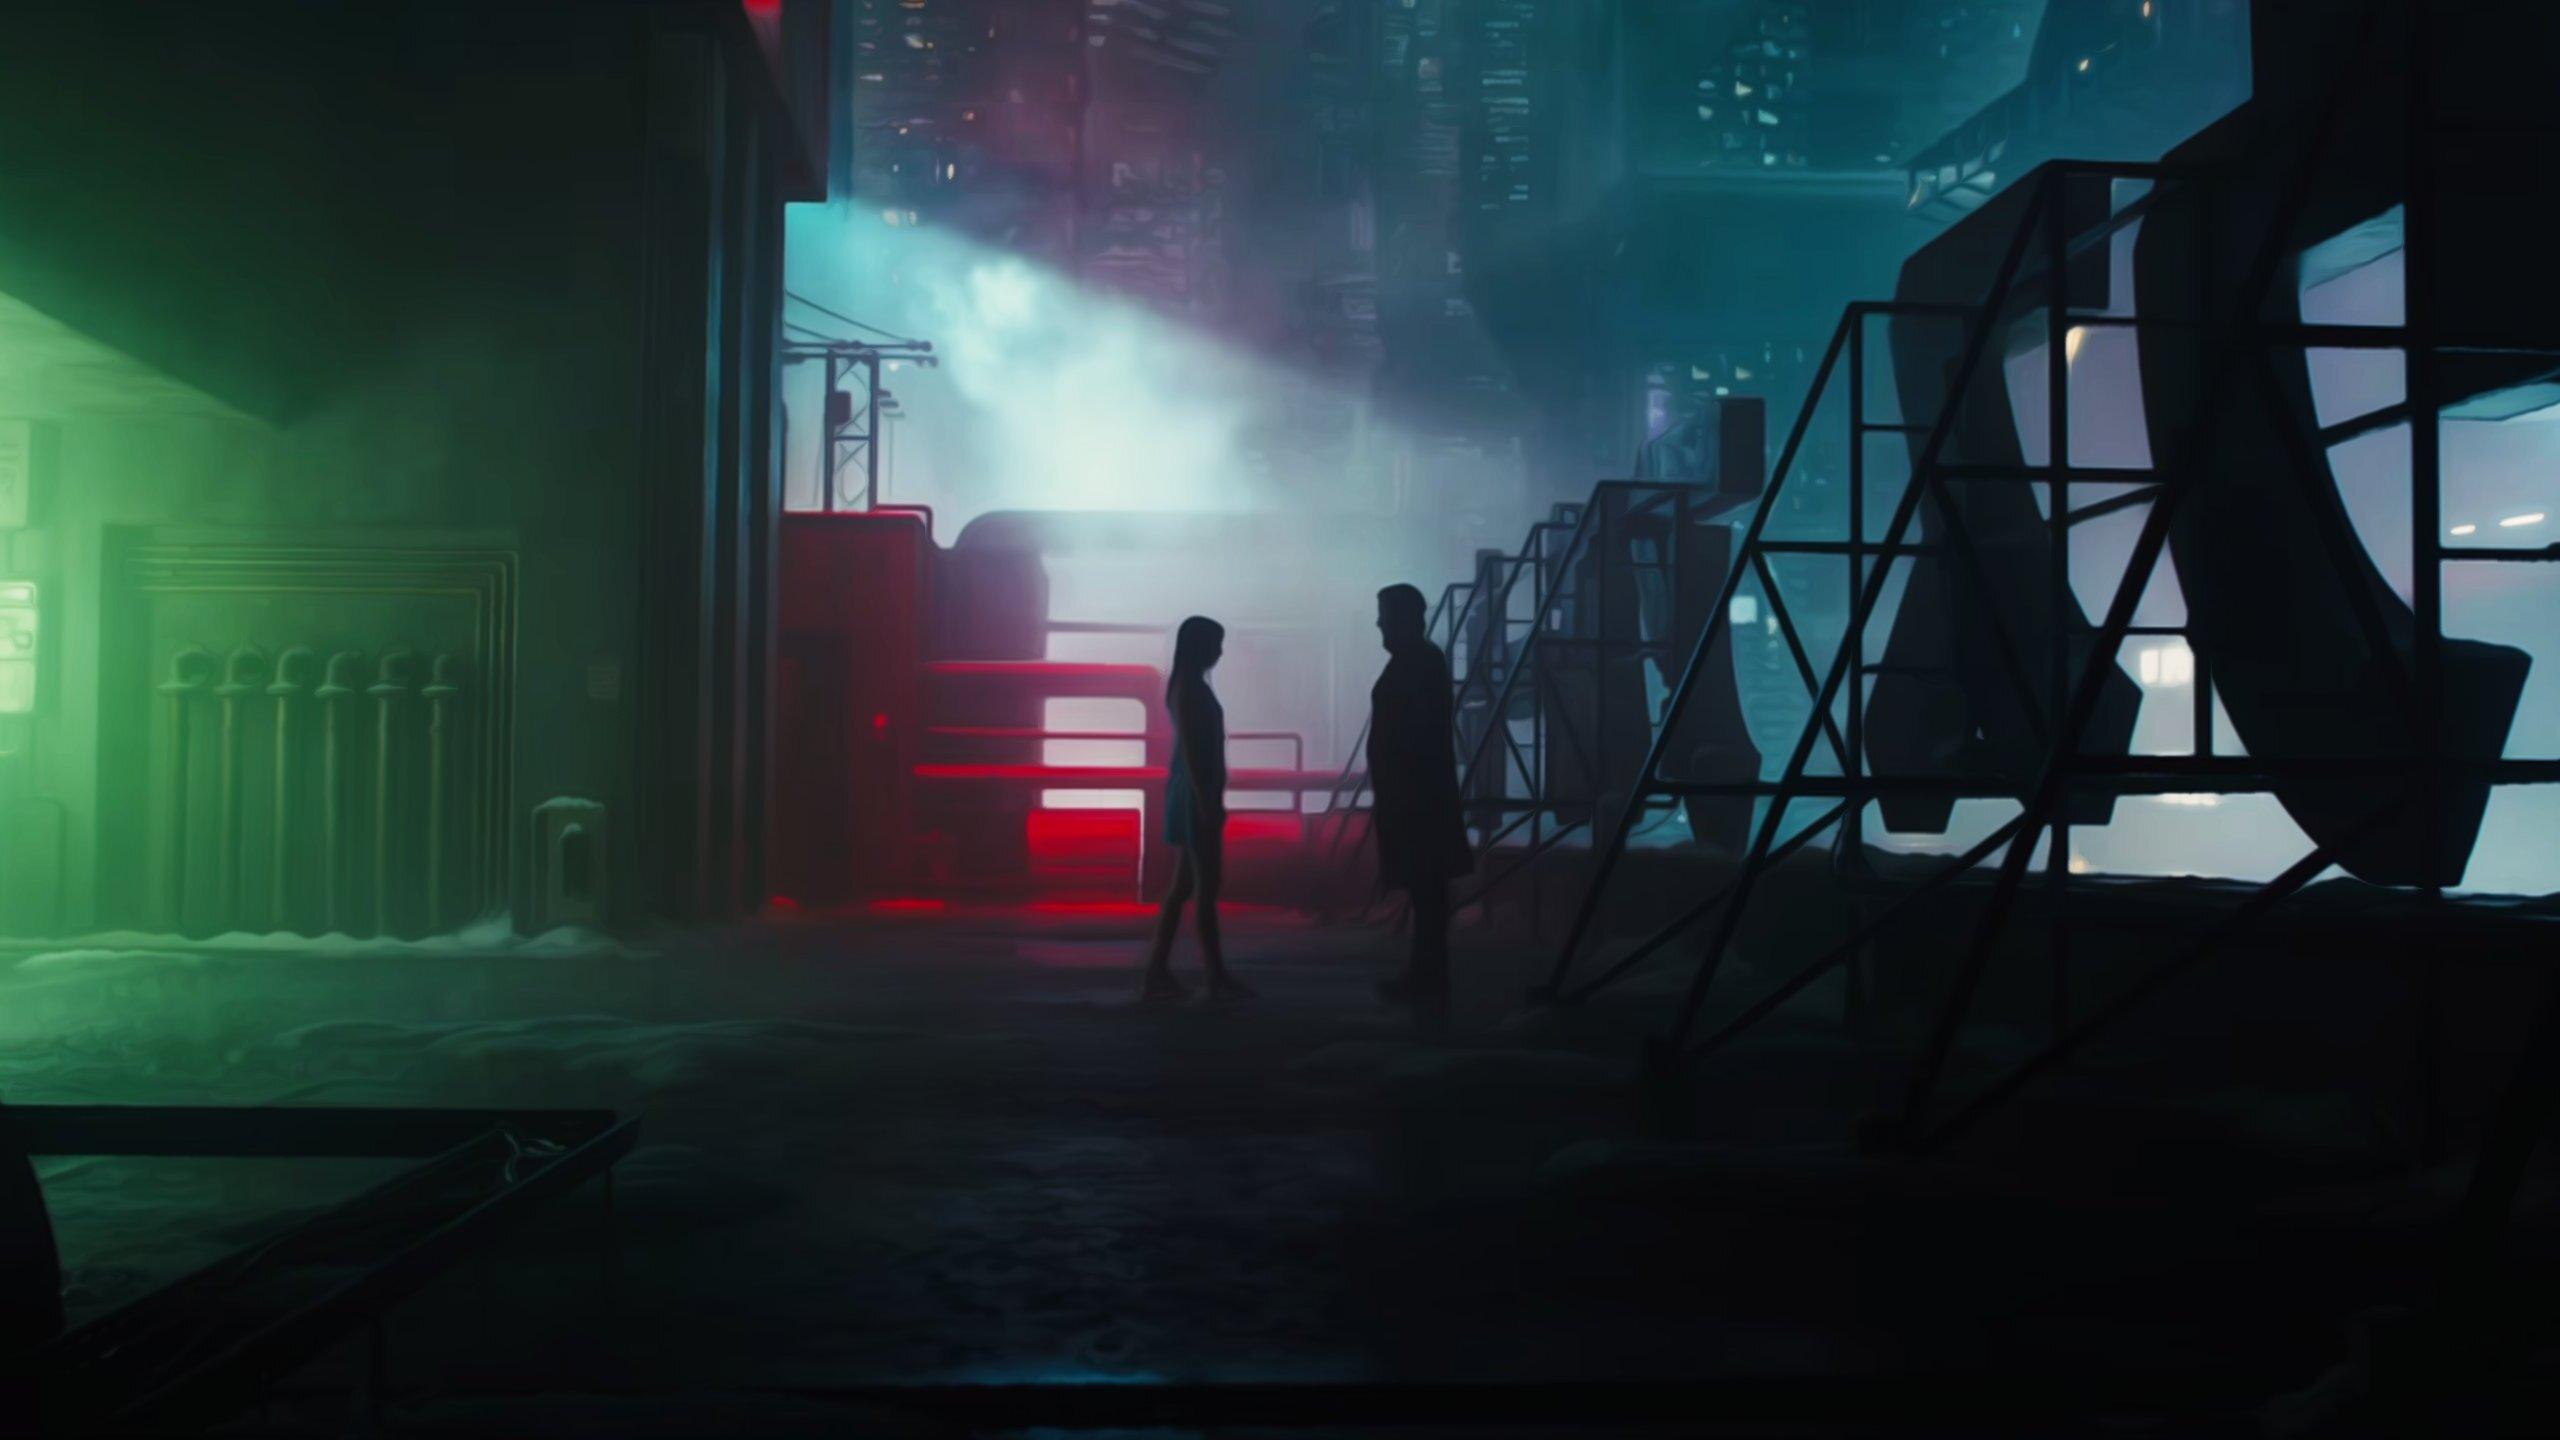 2560x1440 4k Blade Runner 2049 Artwork 1440P Resolution HD ...